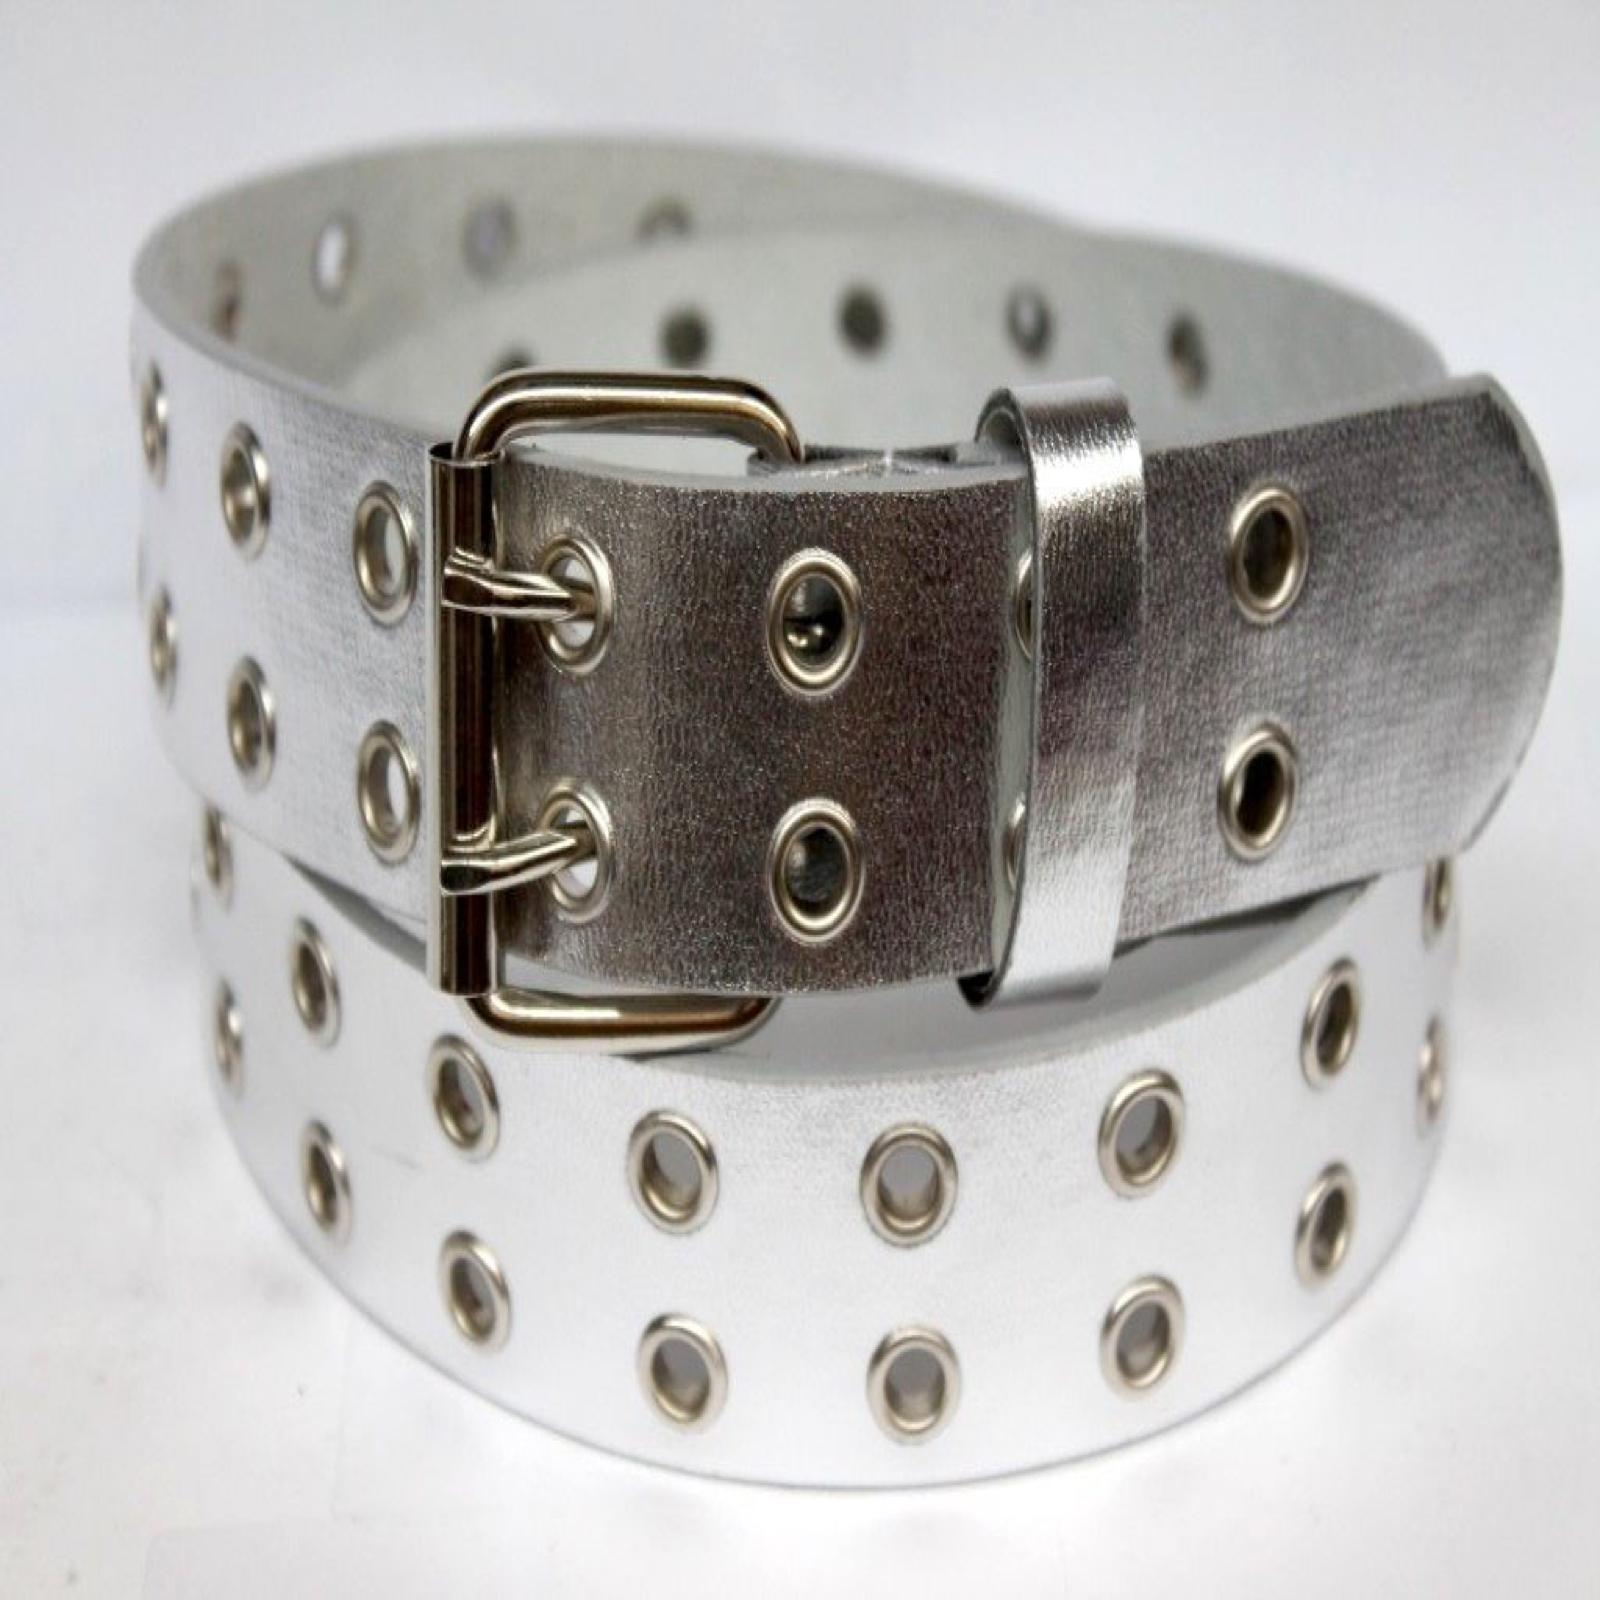 Double-Silver-Grommet-2-Holes-Leather-Belt-2-Prong-buckle-Unisex-Mens-Womens